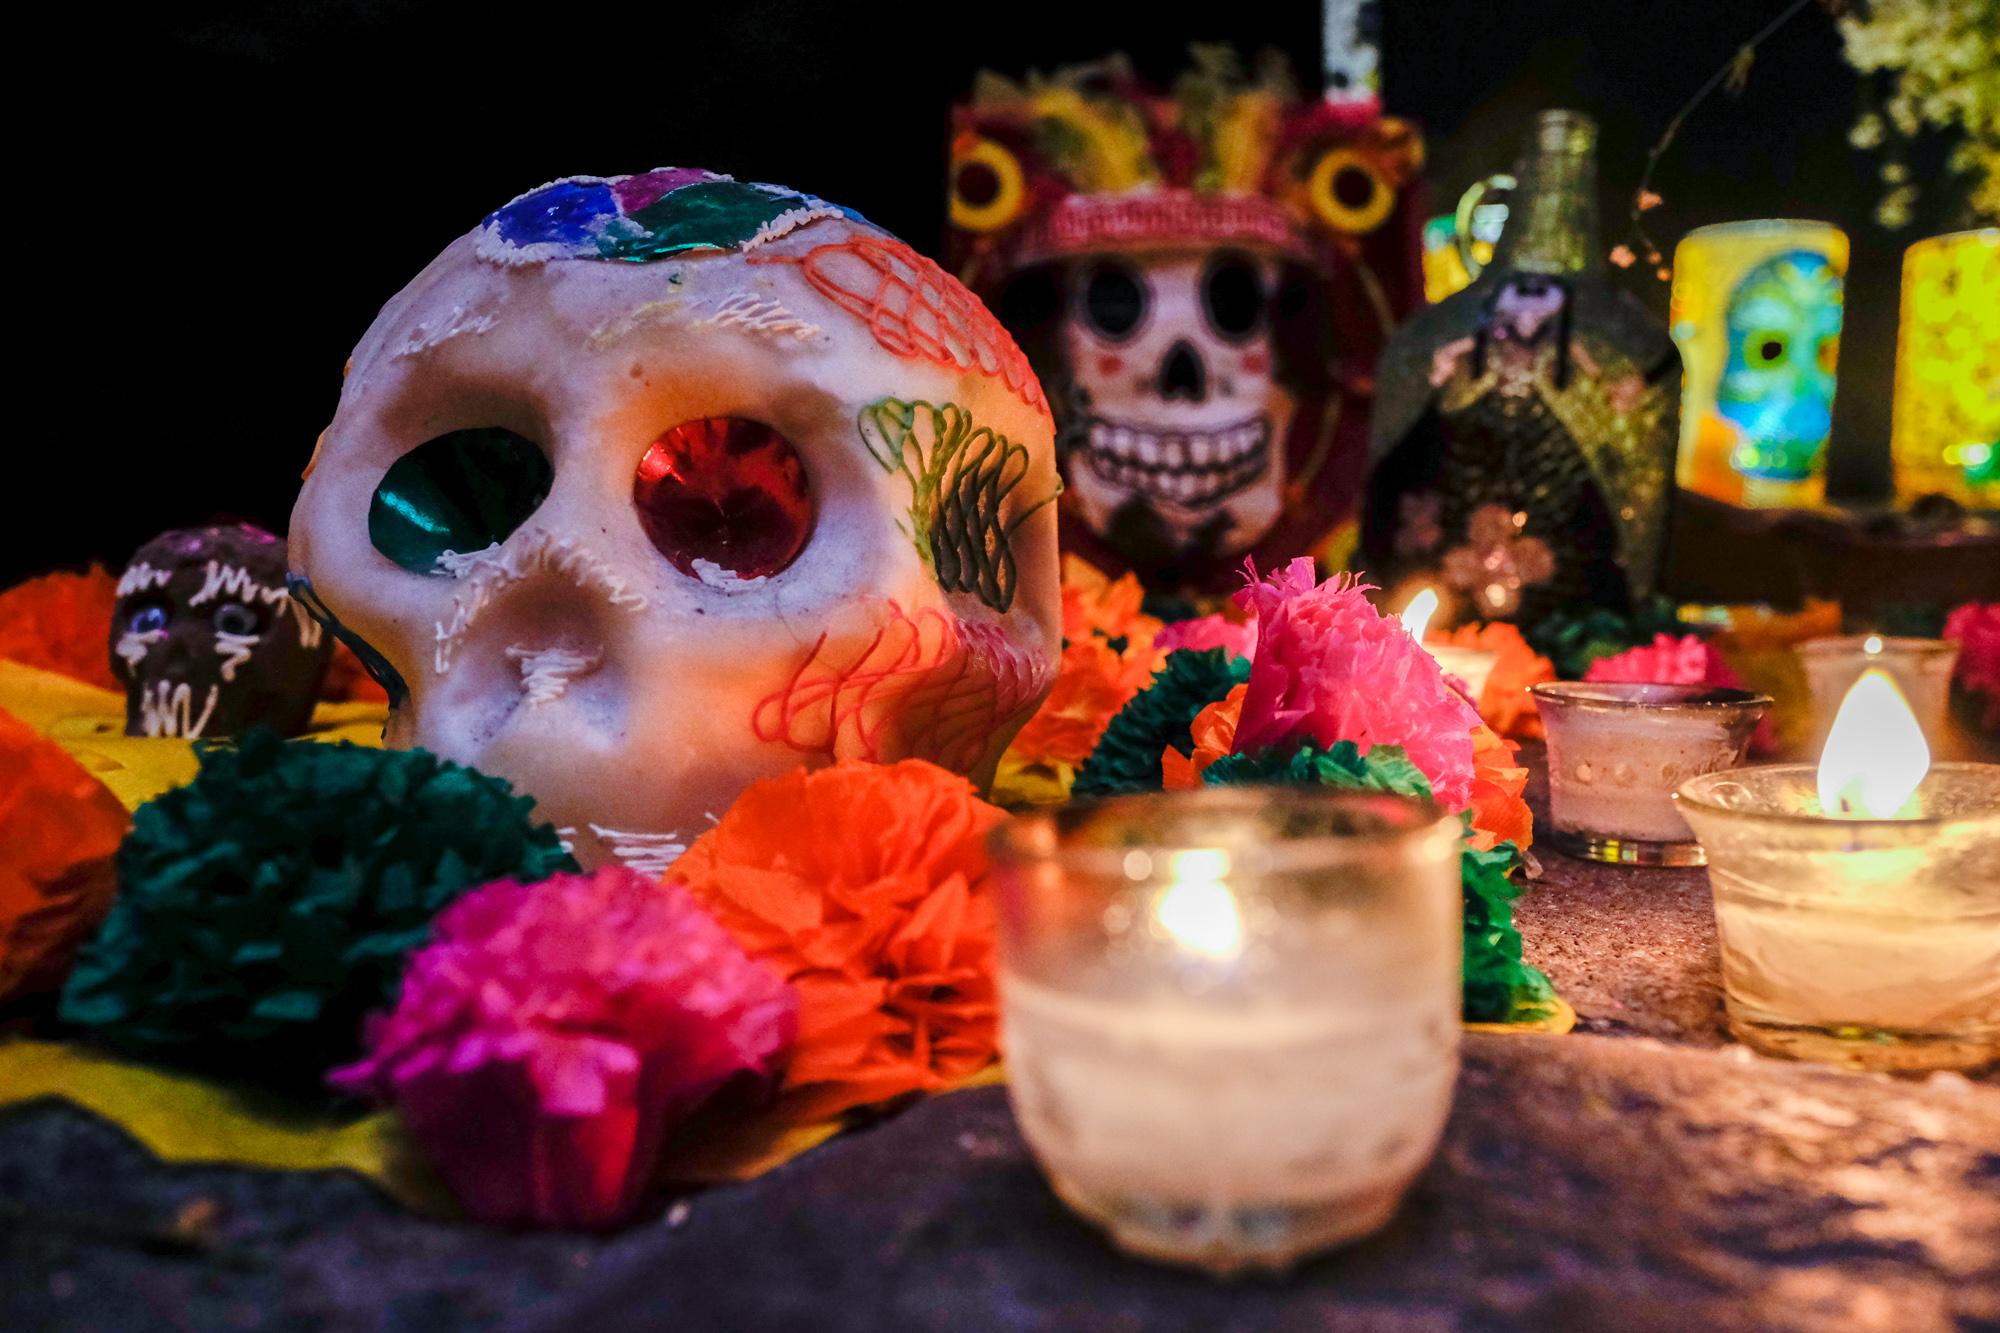 muertos dia mexico los mixquic san experiencing elevate andres adventures november elevatephotography header